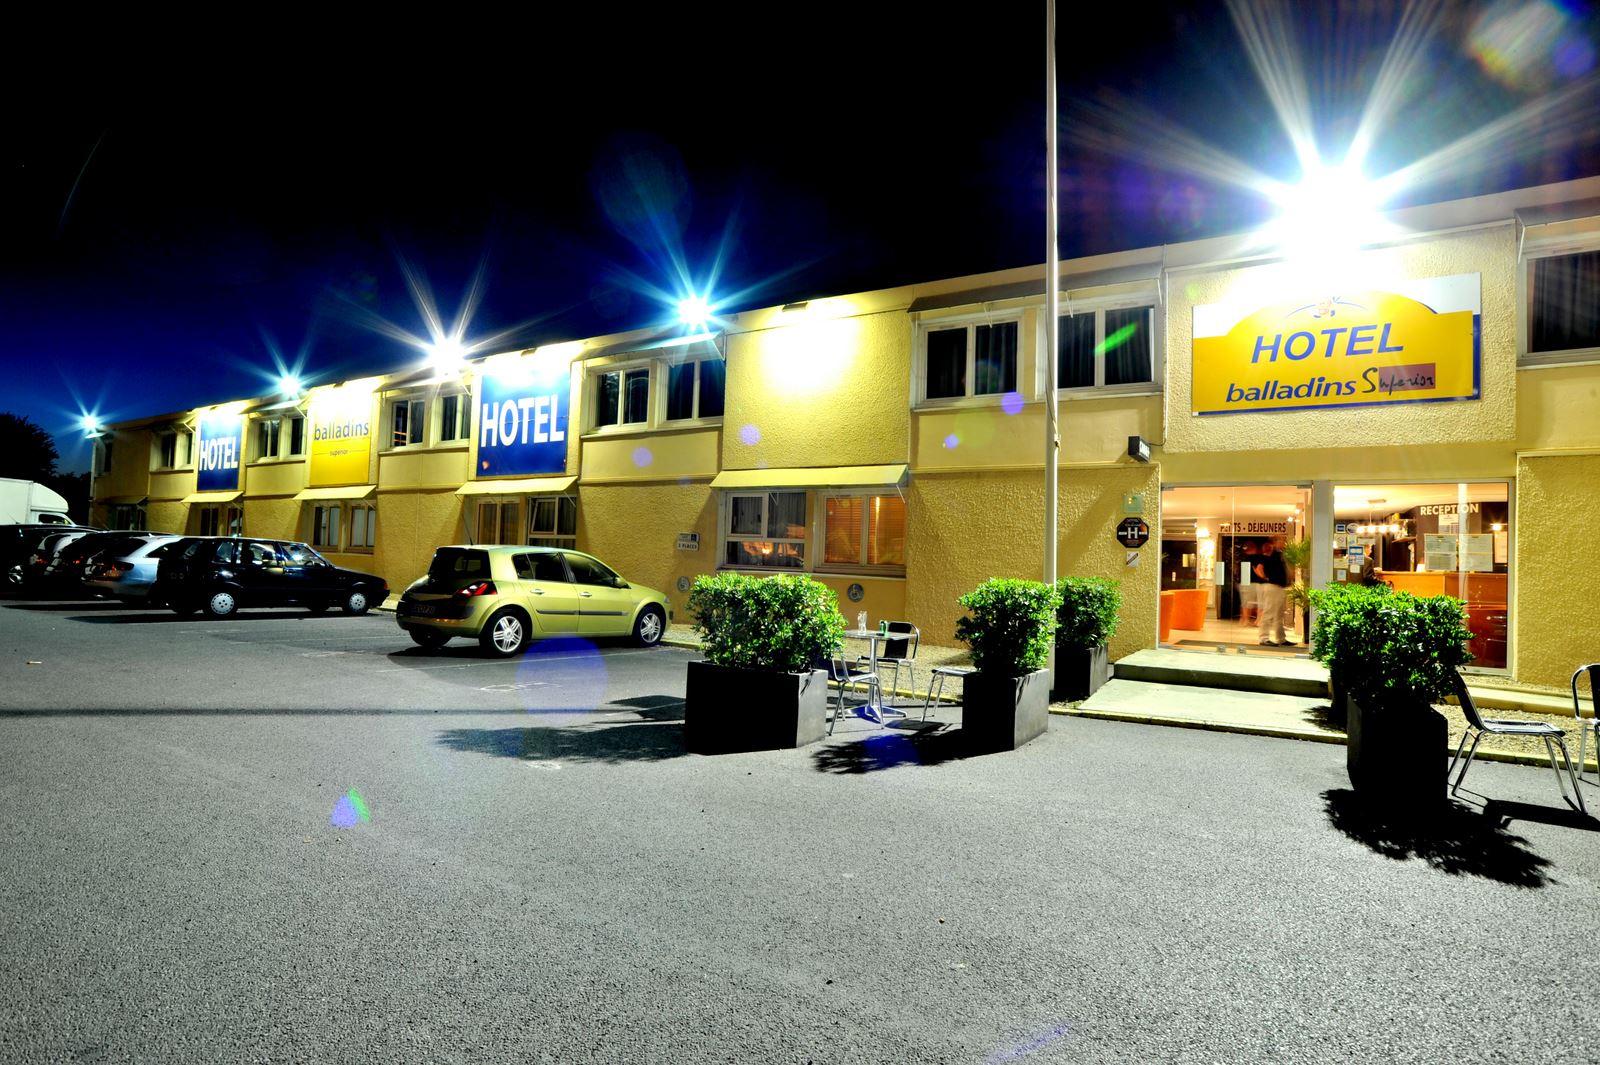 Hotel Balladins Parc des Expositions